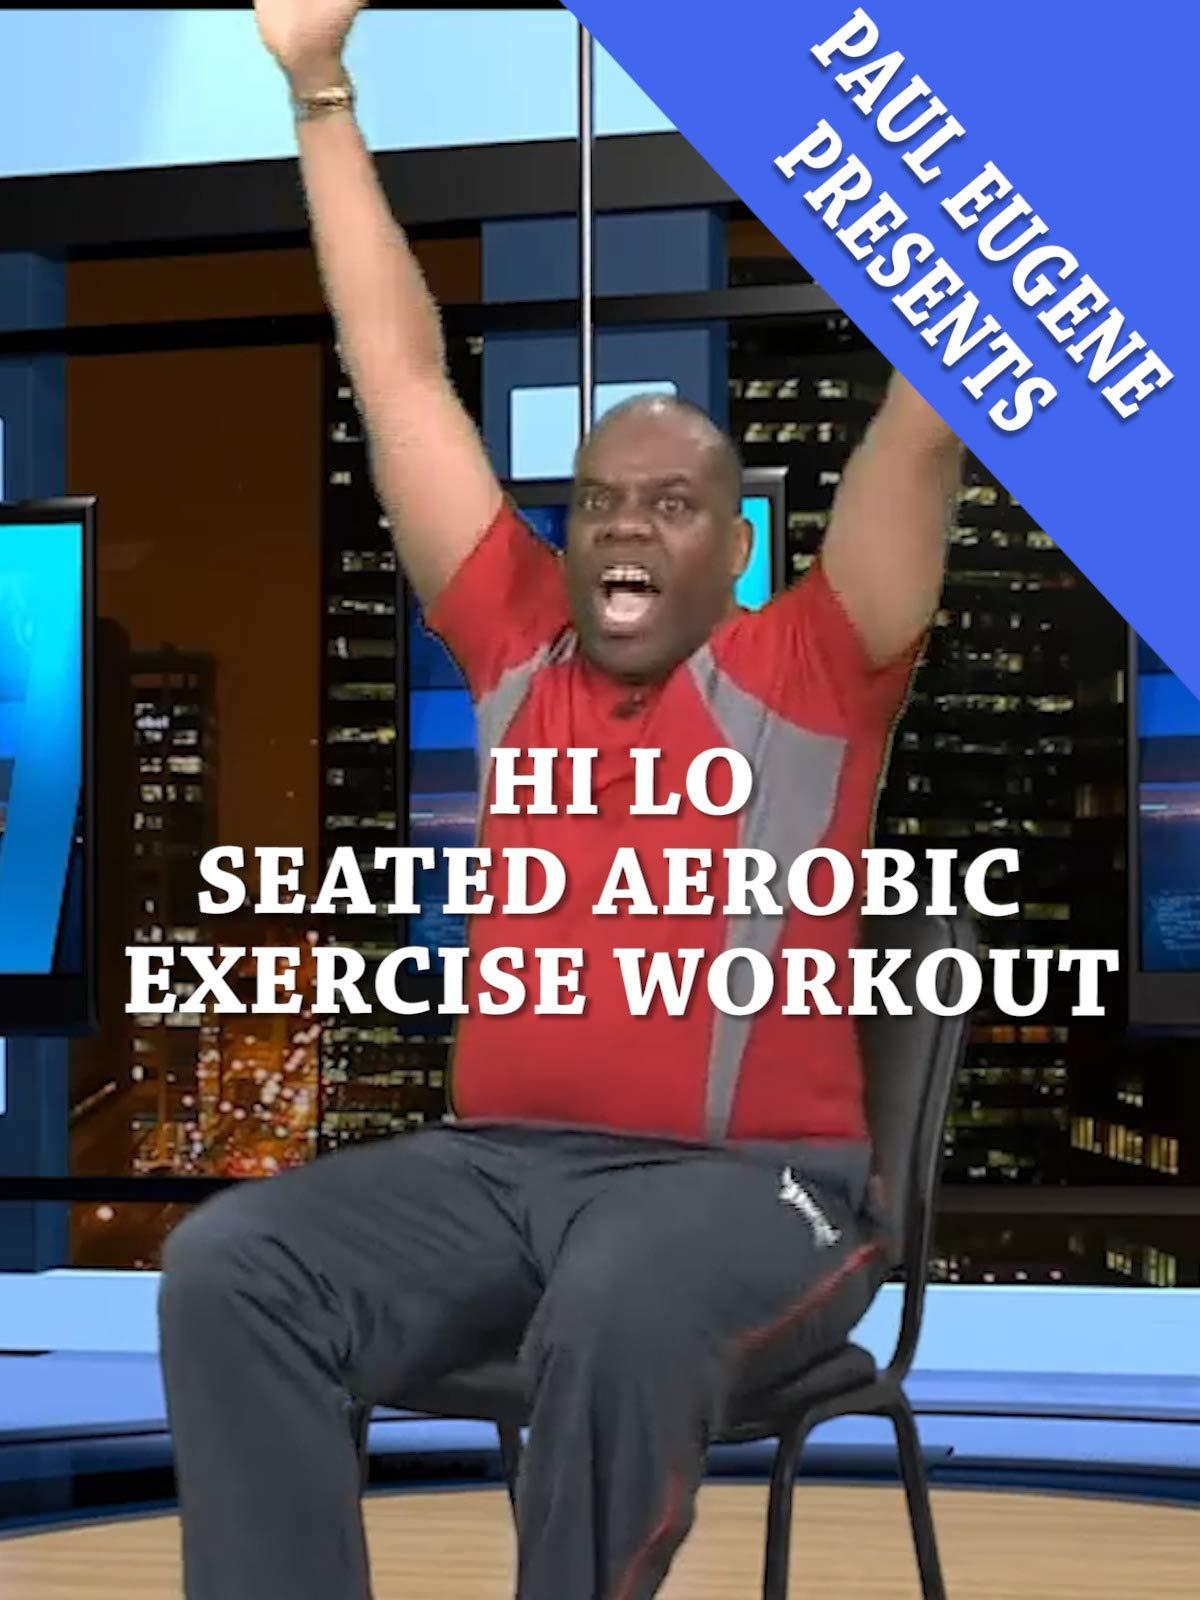 Hi Lo Seated Aerobic Exercise Workout